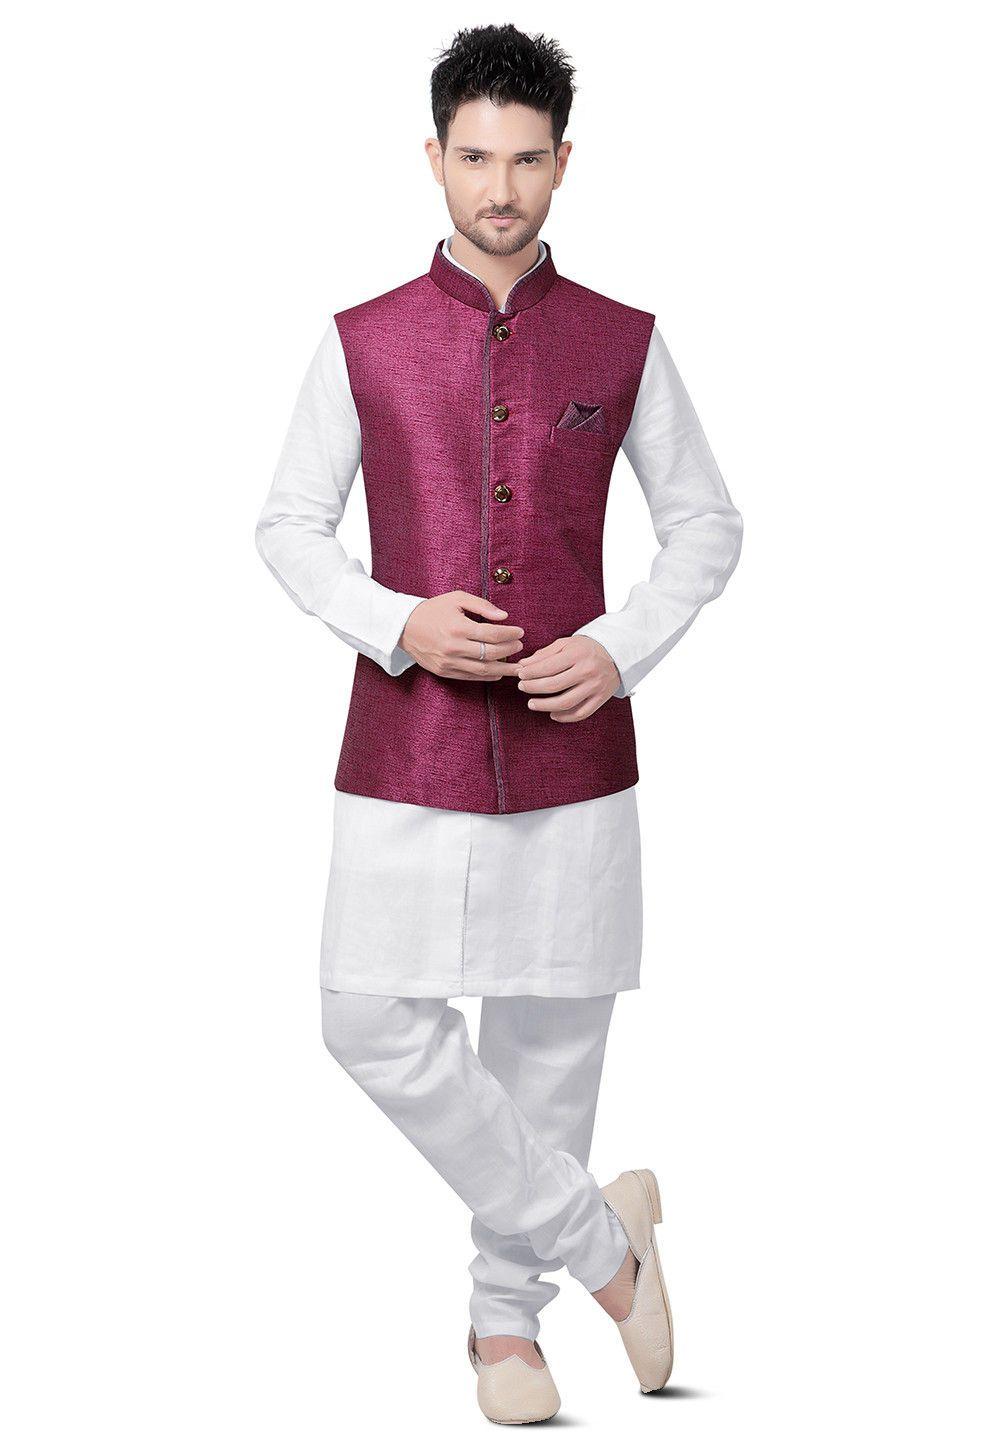 Readymade cotton linen collar neck and full sleeve kurta in white